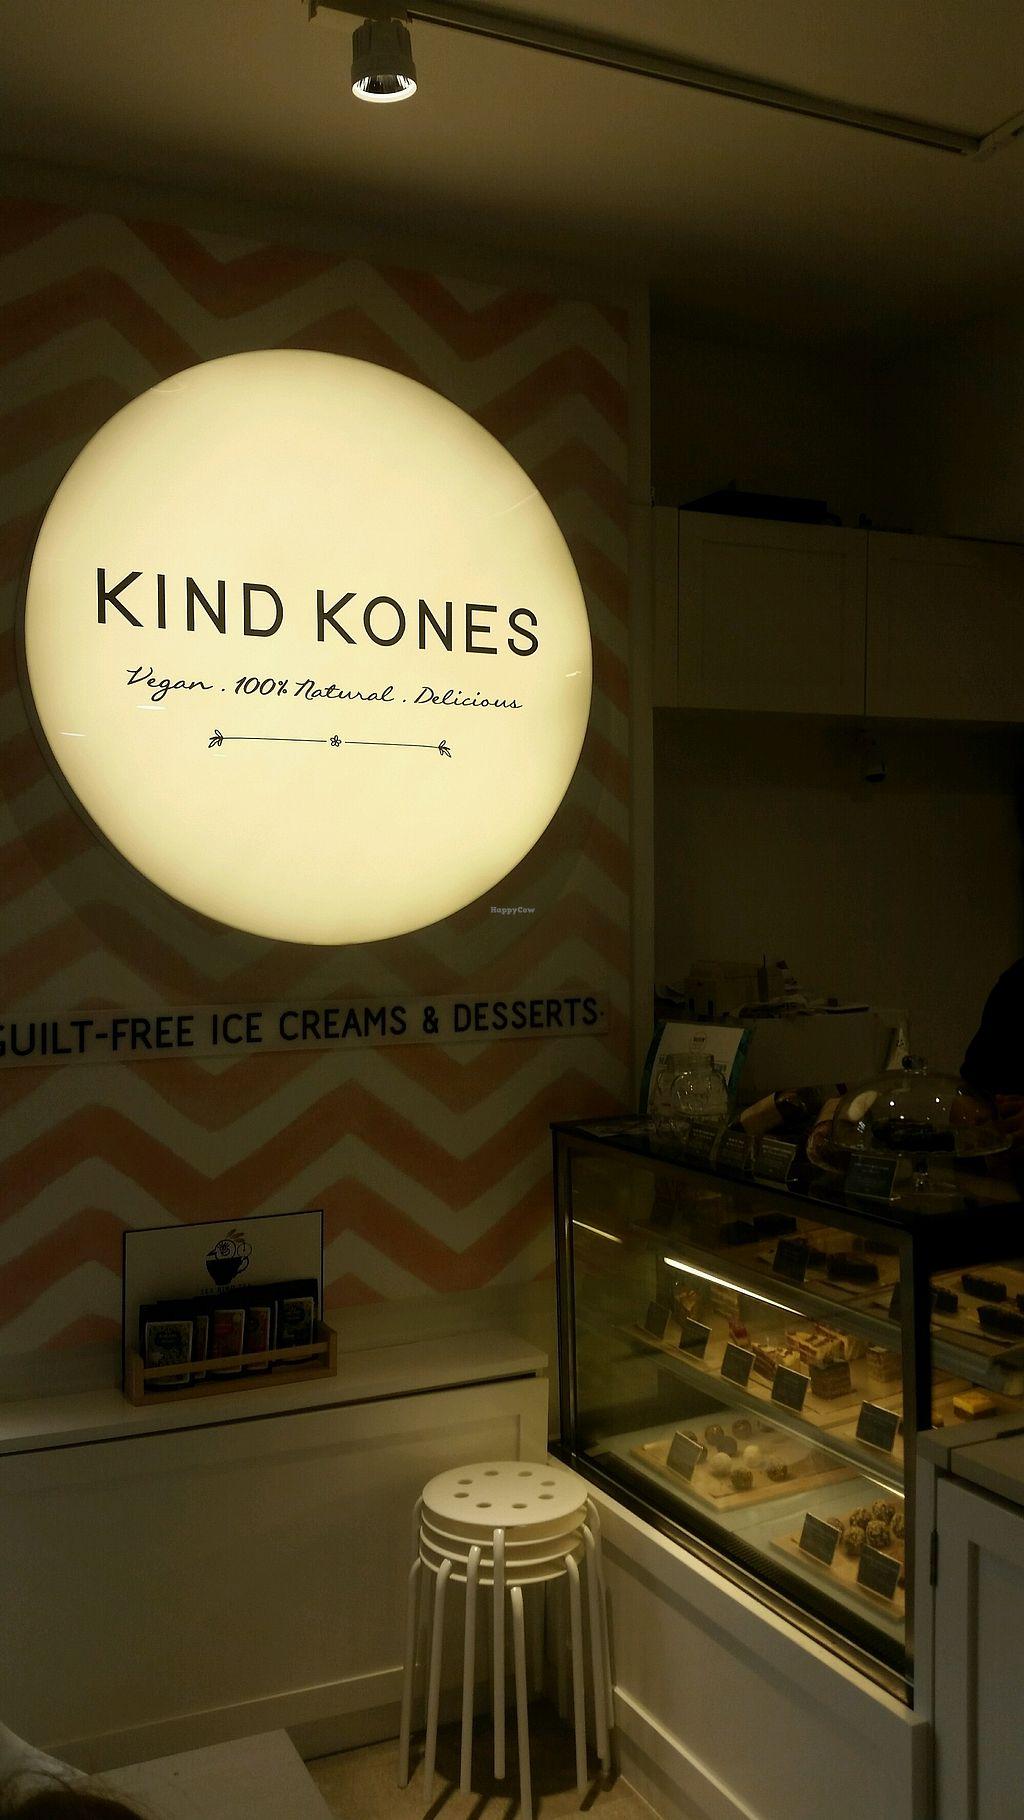 "Photo of Kind Kones - Mont Kiara  by <a href=""/members/profile/tobiasmagicmagic"">tobiasmagicmagic</a> <br/>got cake too <br/> September 20, 2017  - <a href='/contact/abuse/image/98940/306365'>Report</a>"